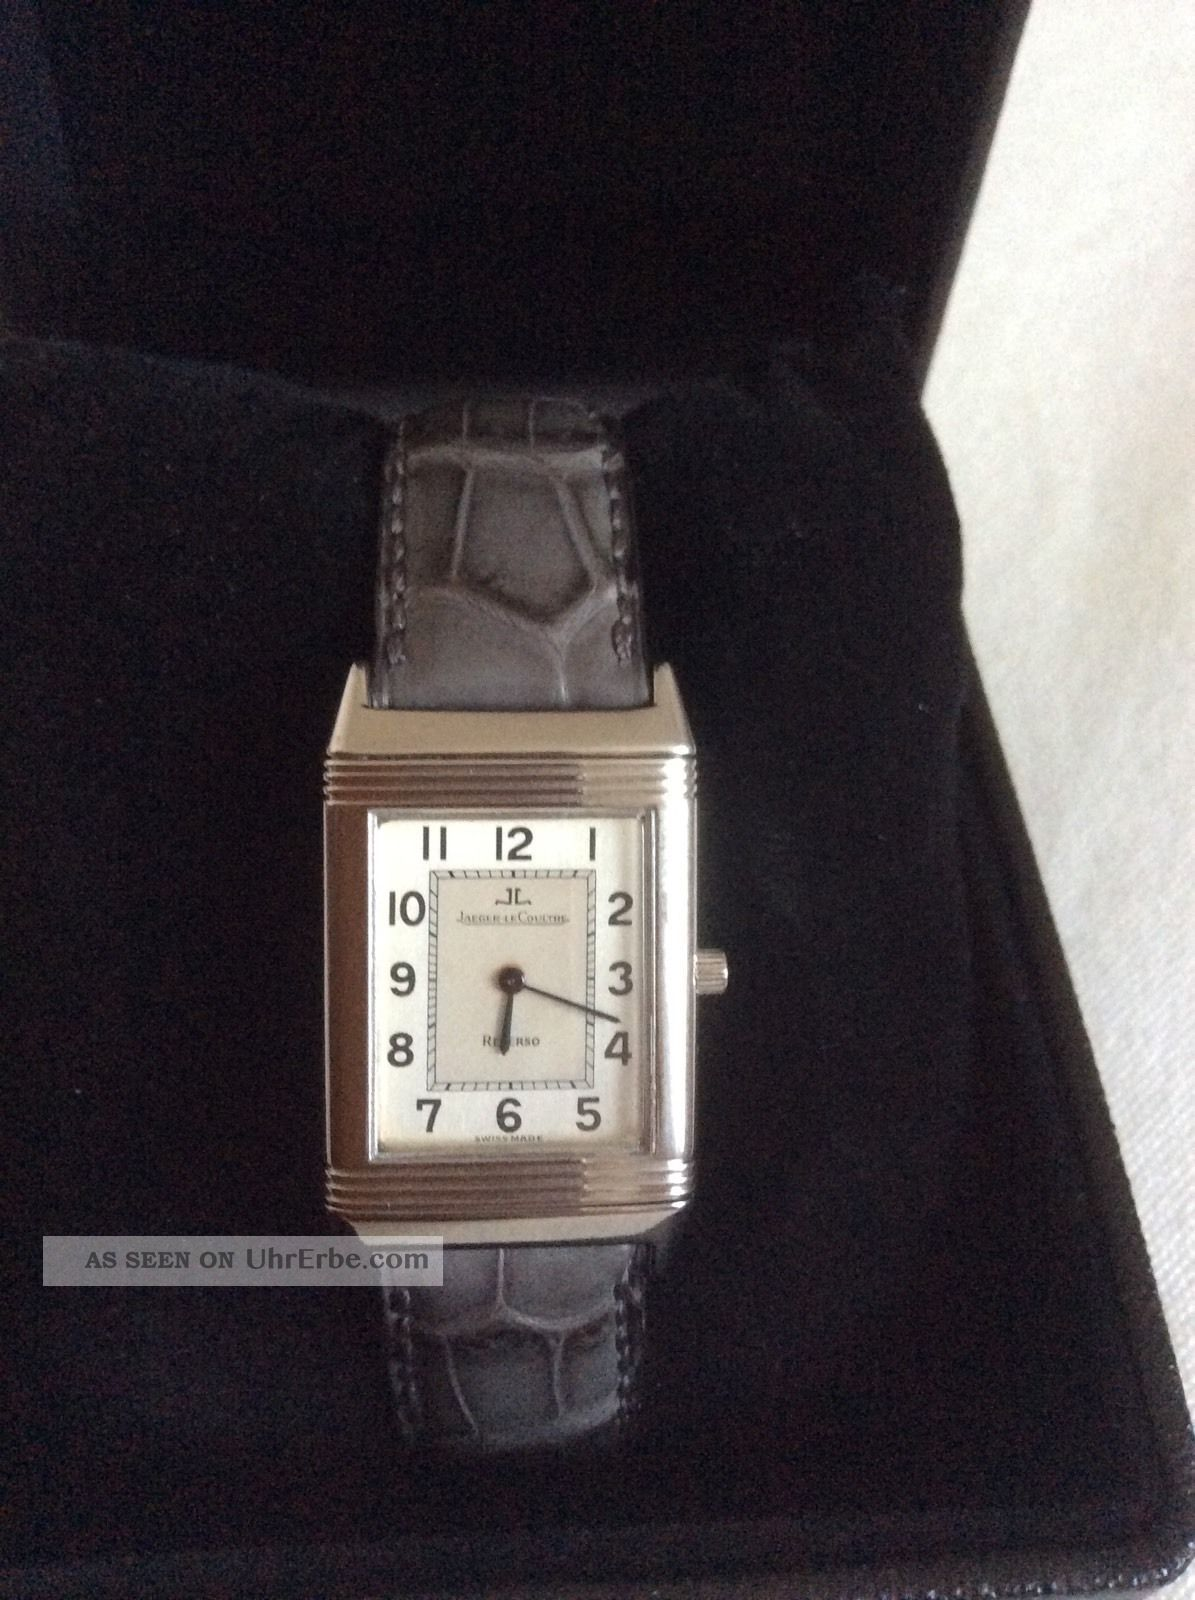 Jaeger Lecoultre Reverso Classic Handaufzug Armbanduhren Bild